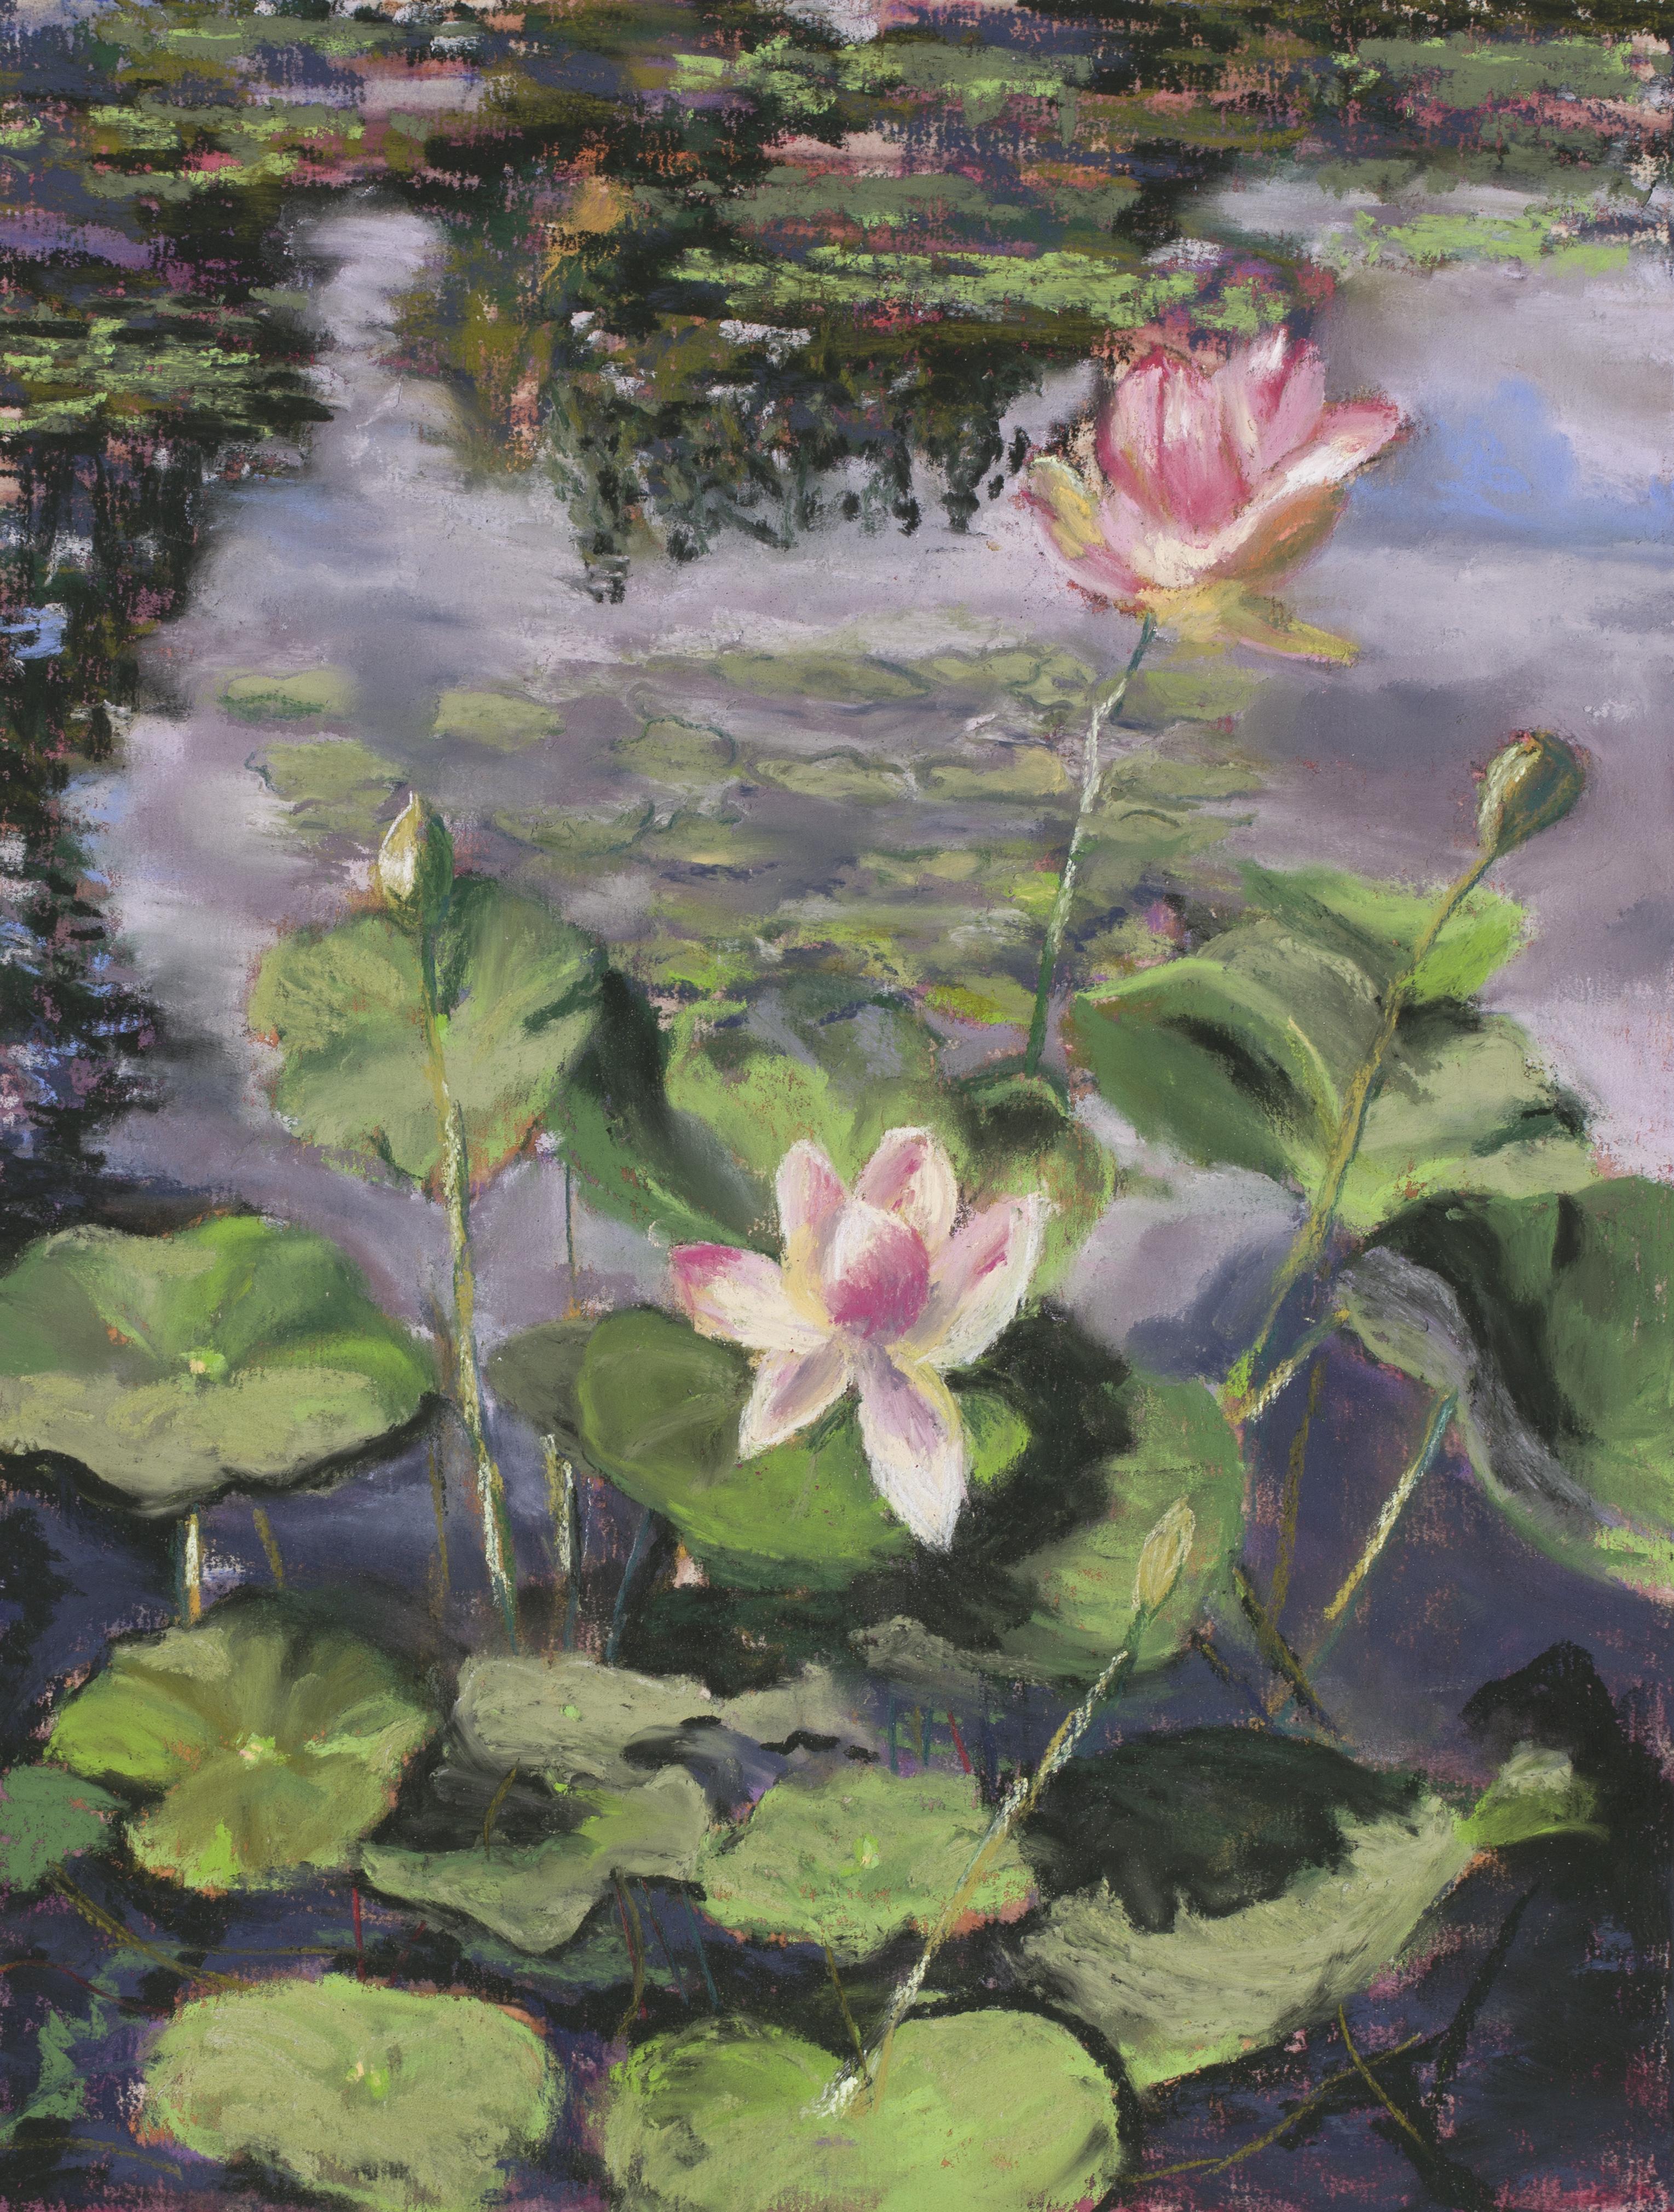 Monet's Reflection